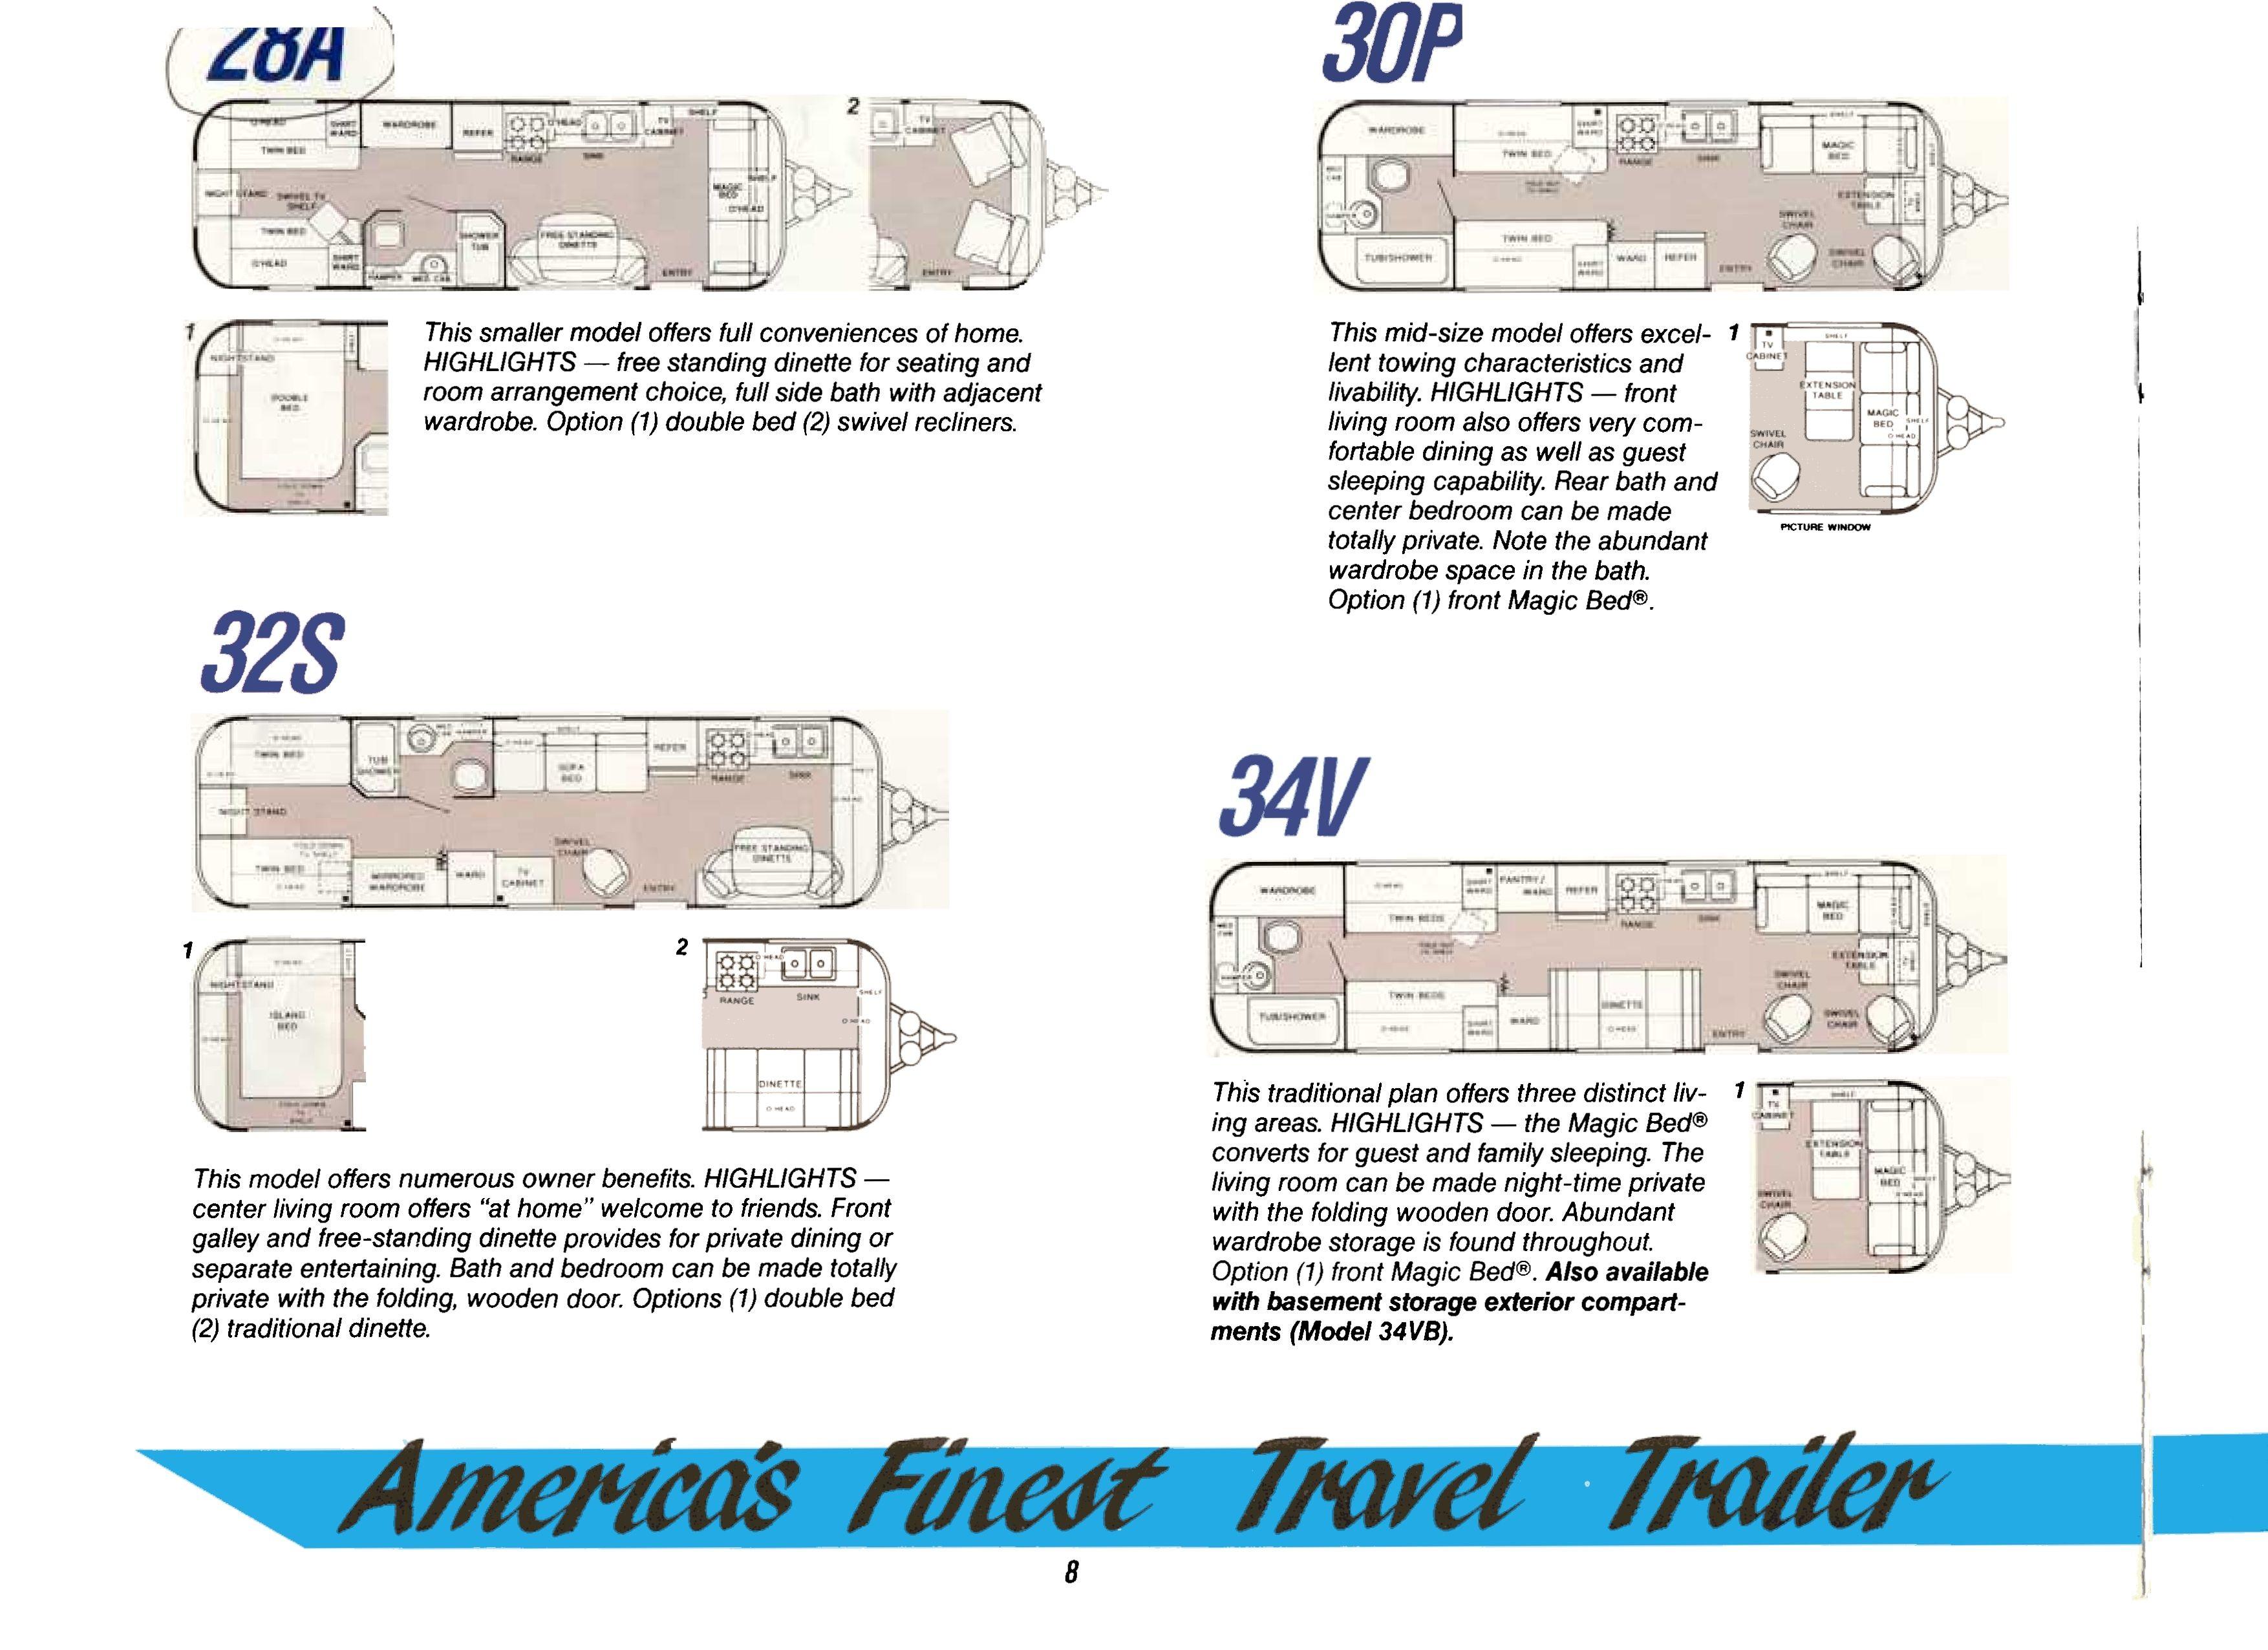 Camper Trailer 12 Volt Wiring Diagram Avion Travelcade Club Travel former Member Fifth Wheel Fleetwood Of Camper Trailer 12 Volt Wiring Diagram